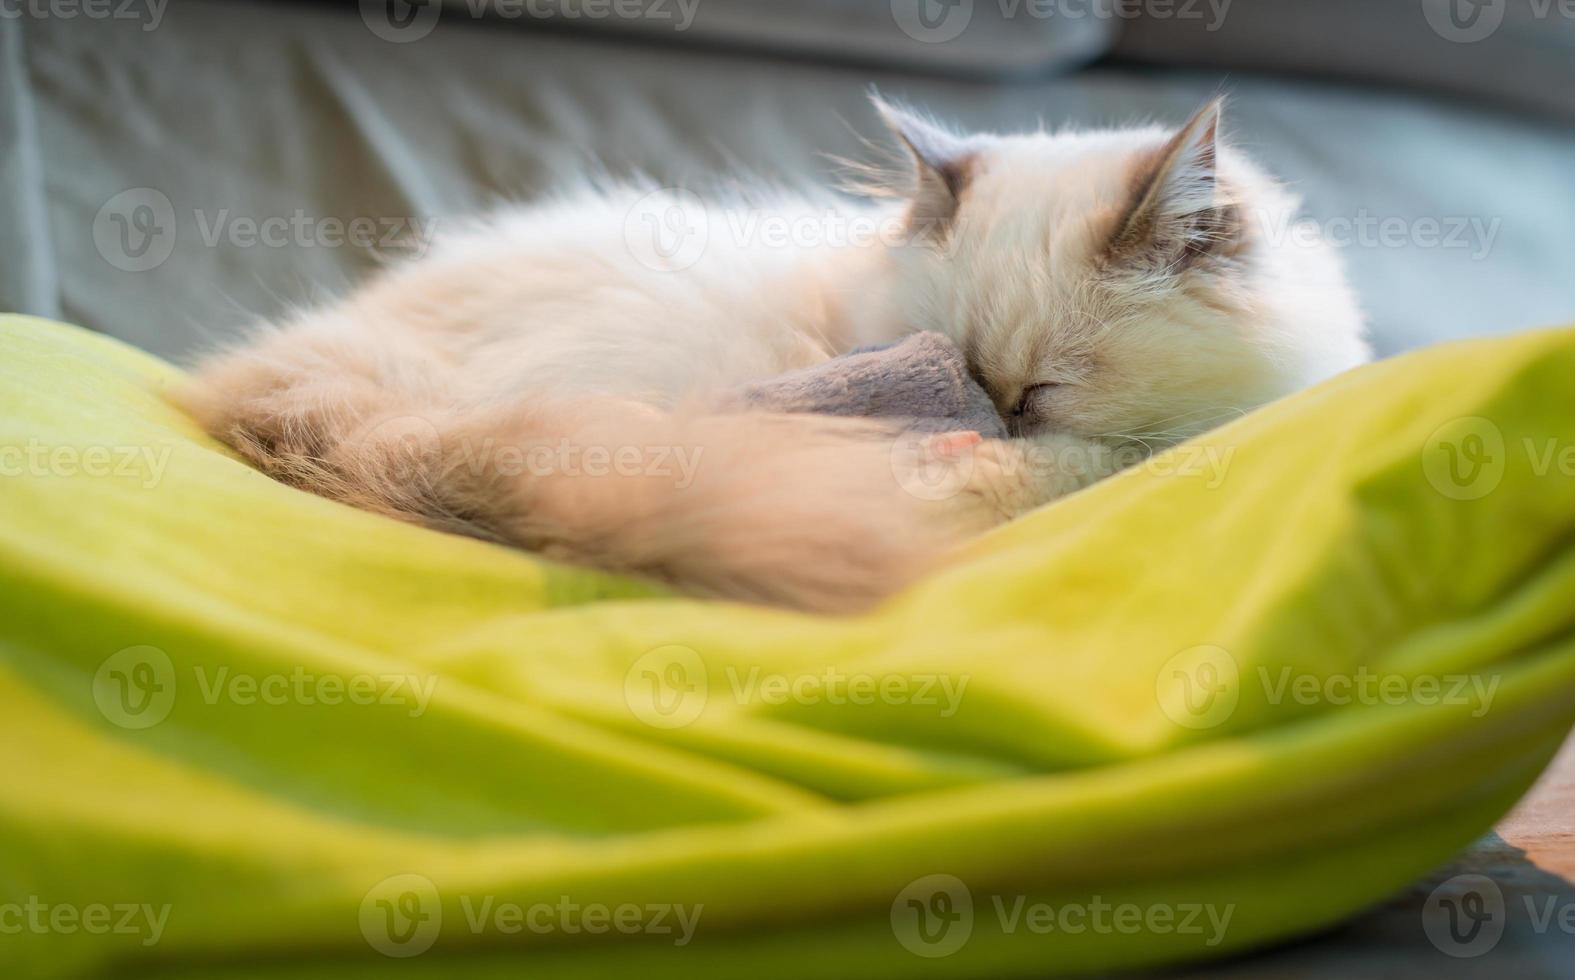 Gato blanco puro durmiendo sobre una almohada verde. foto